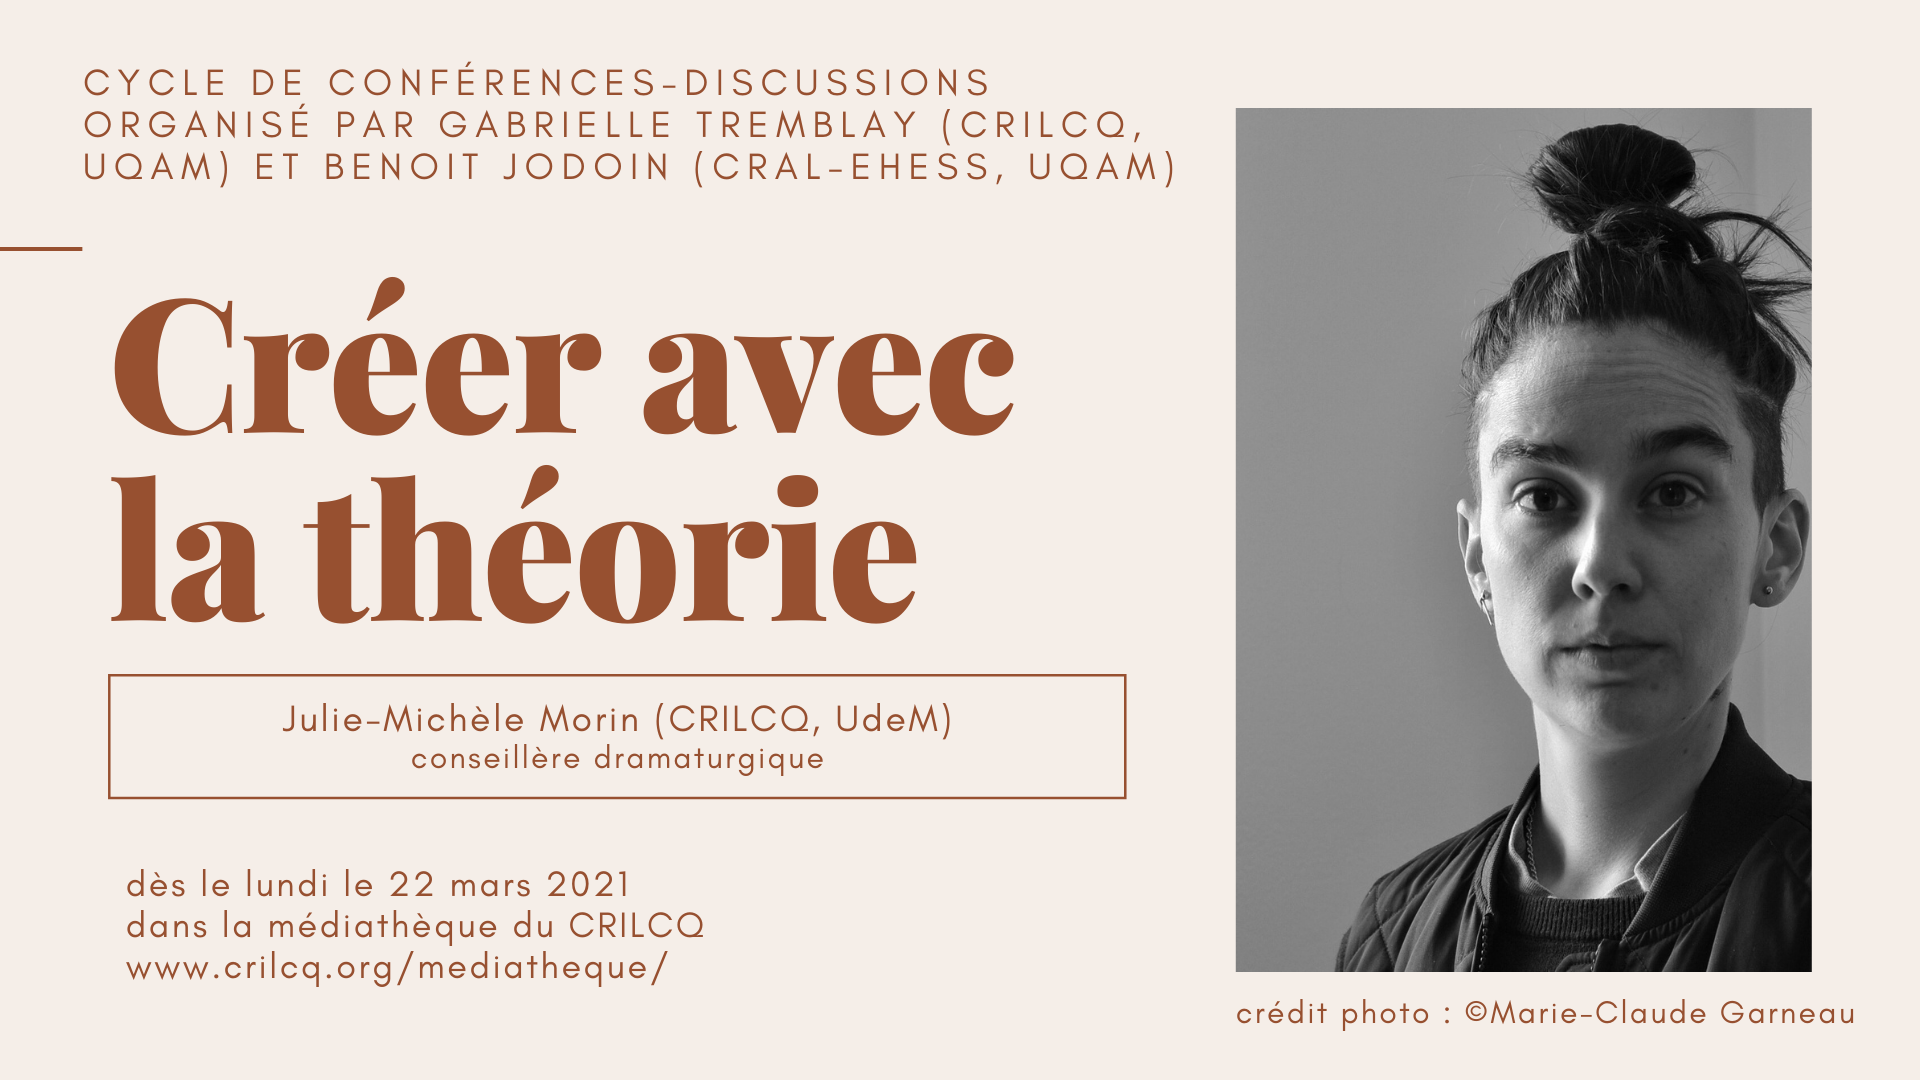 IMAGE-evenement-conference-creer-avec-la-theorie-julie-michele-morin